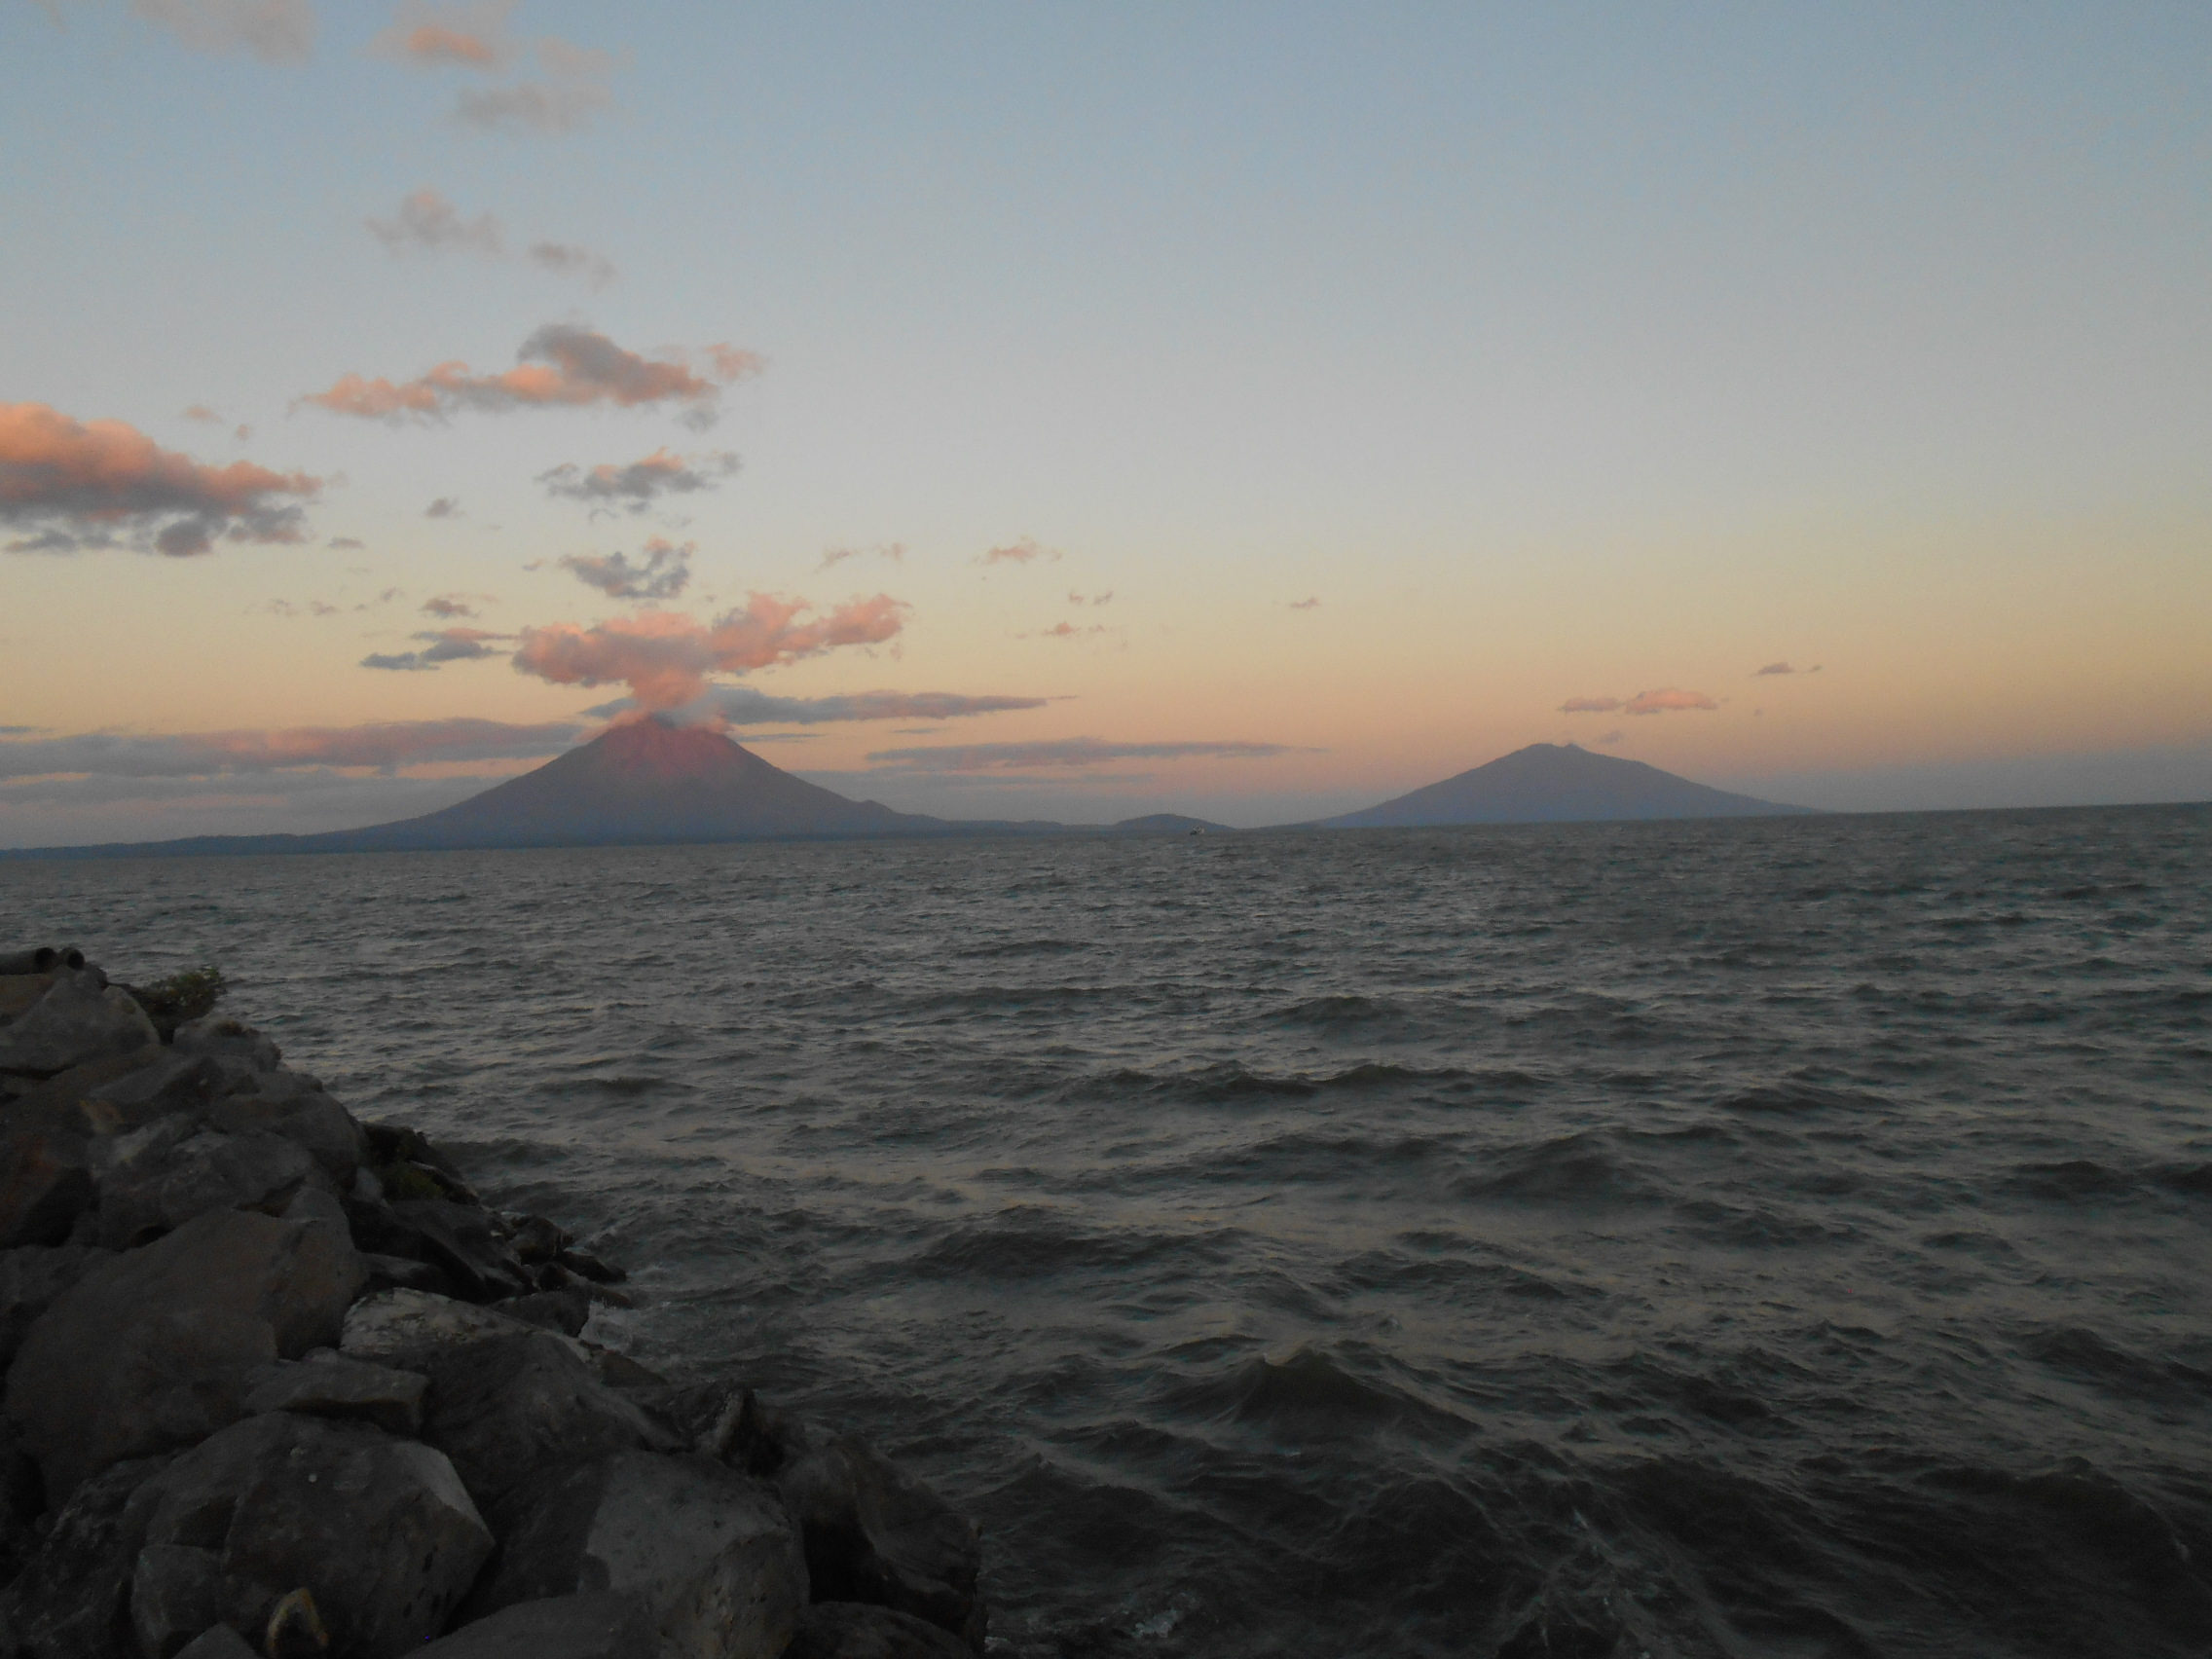 Nicaragua, Central America